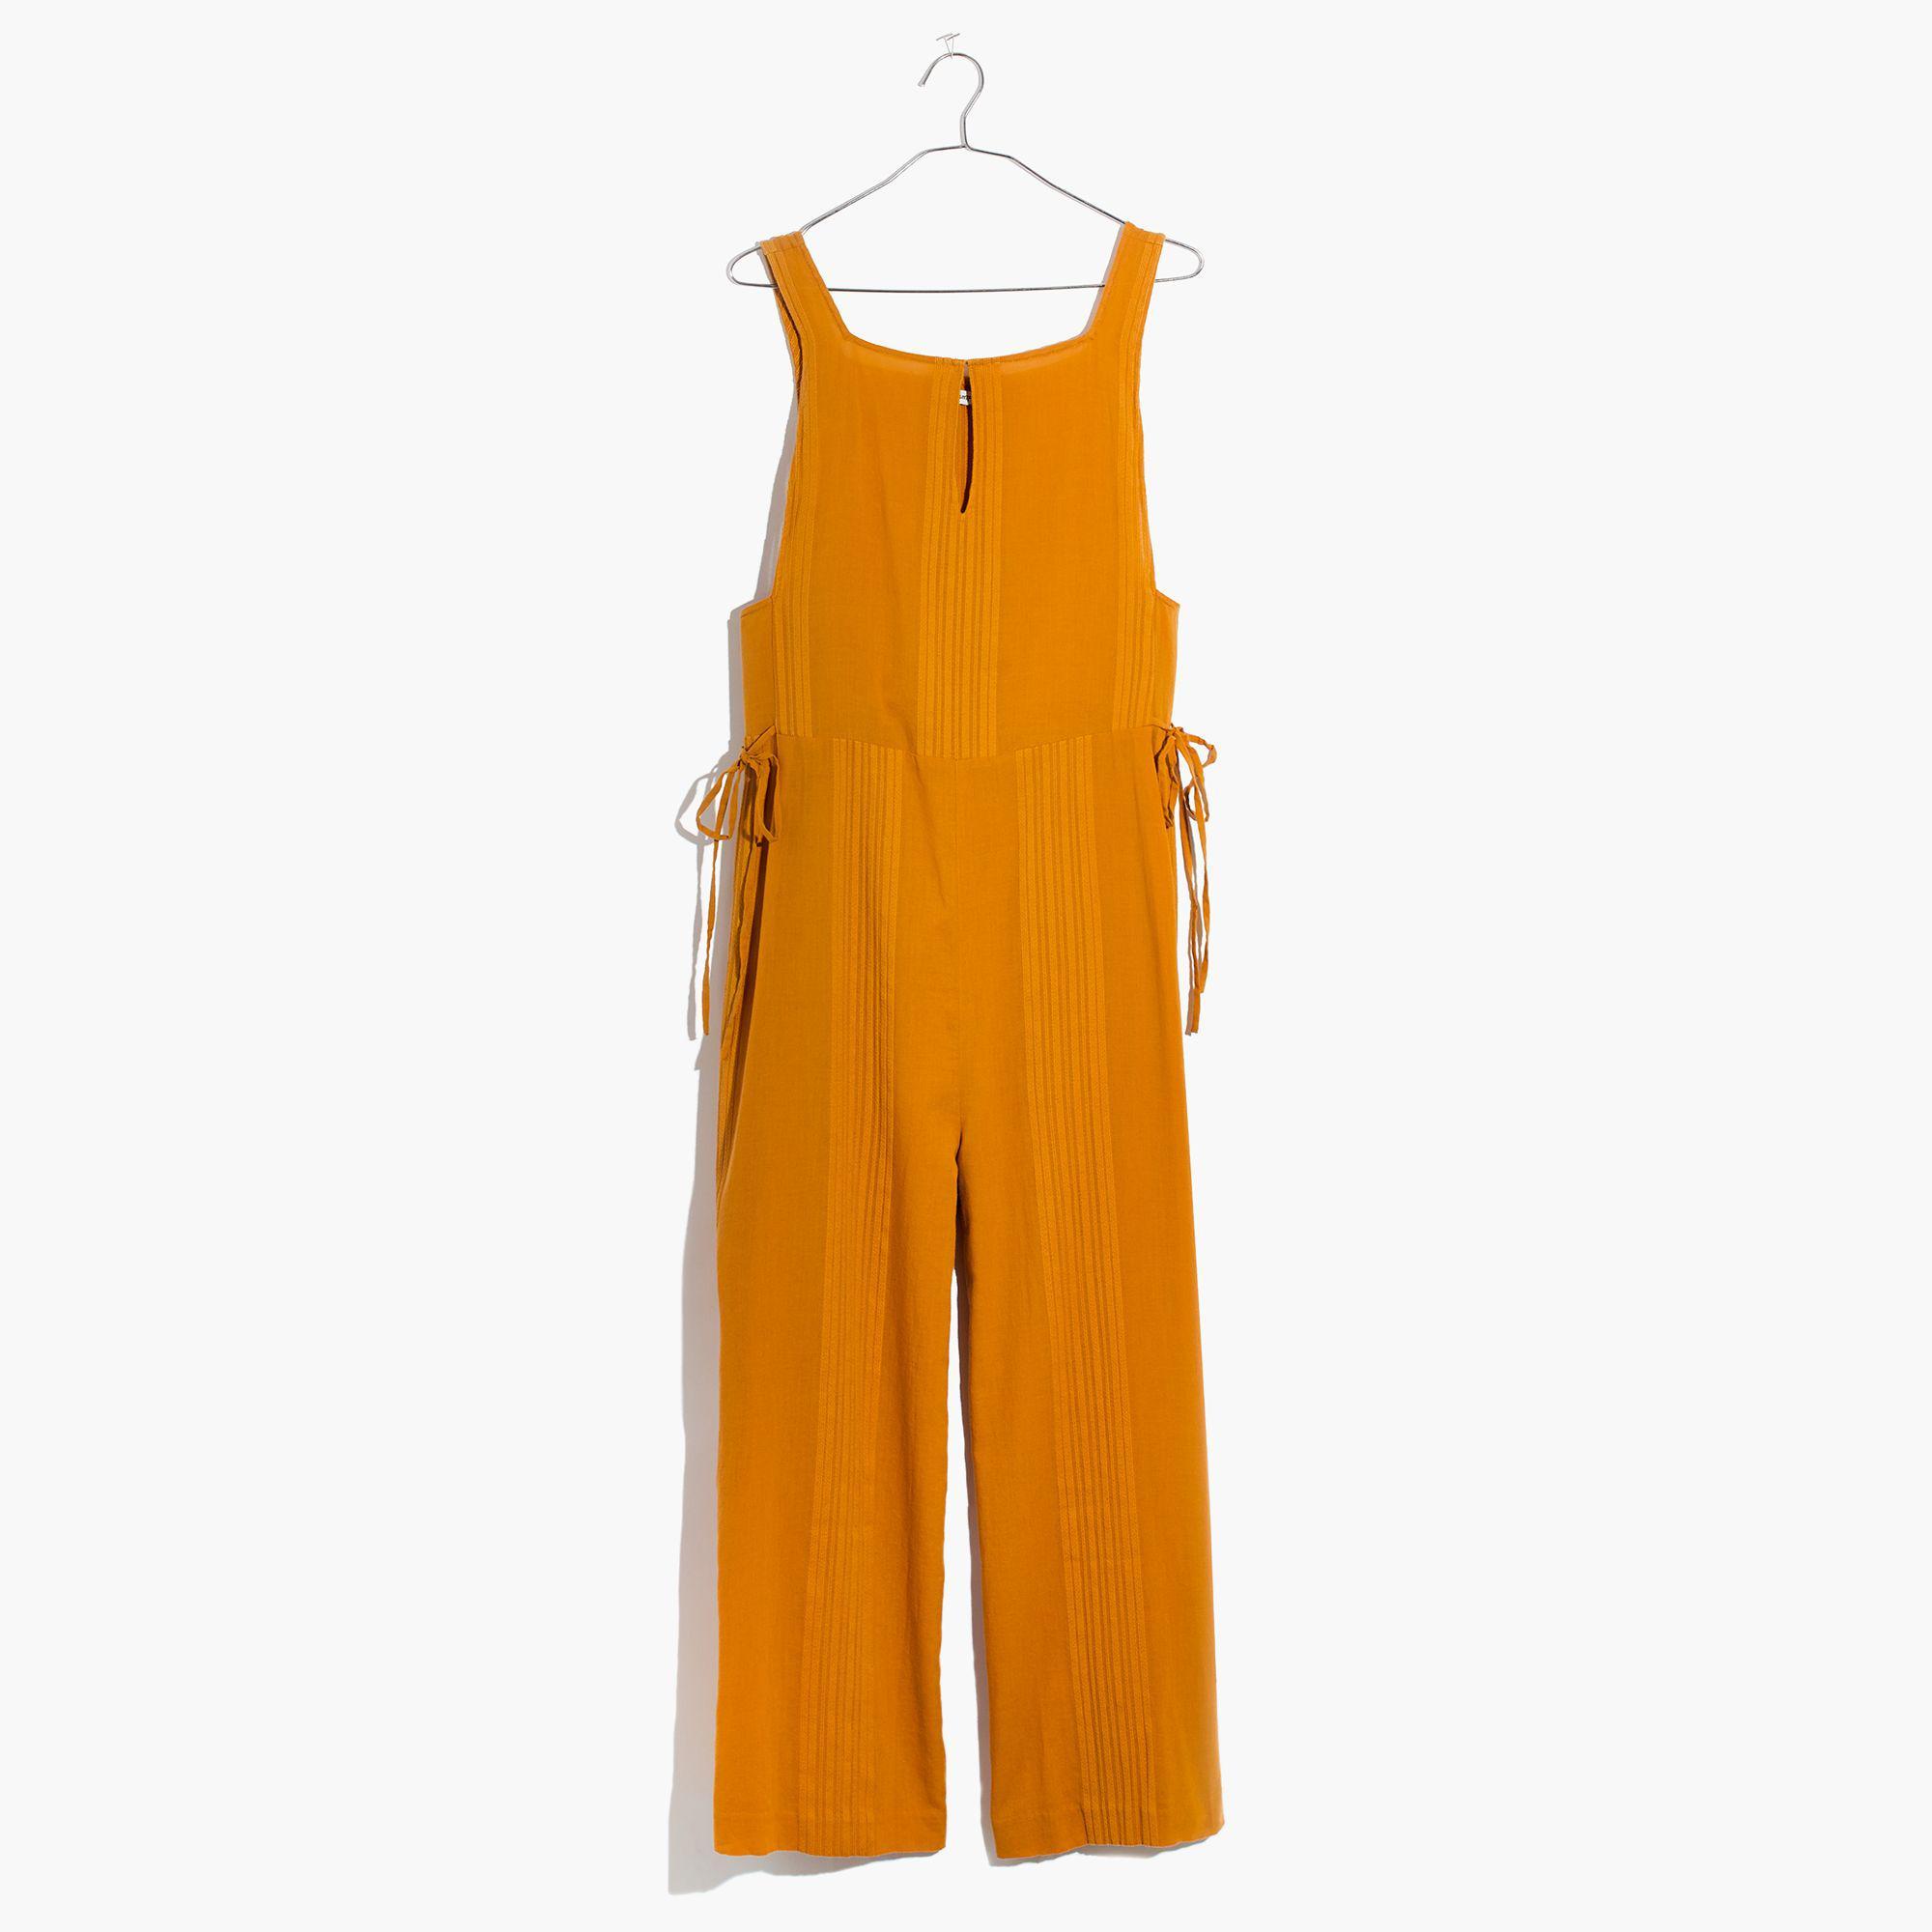 f1380339bcc86 Madewell Esperanza Cover-up Jumpsuit in Orange - Lyst